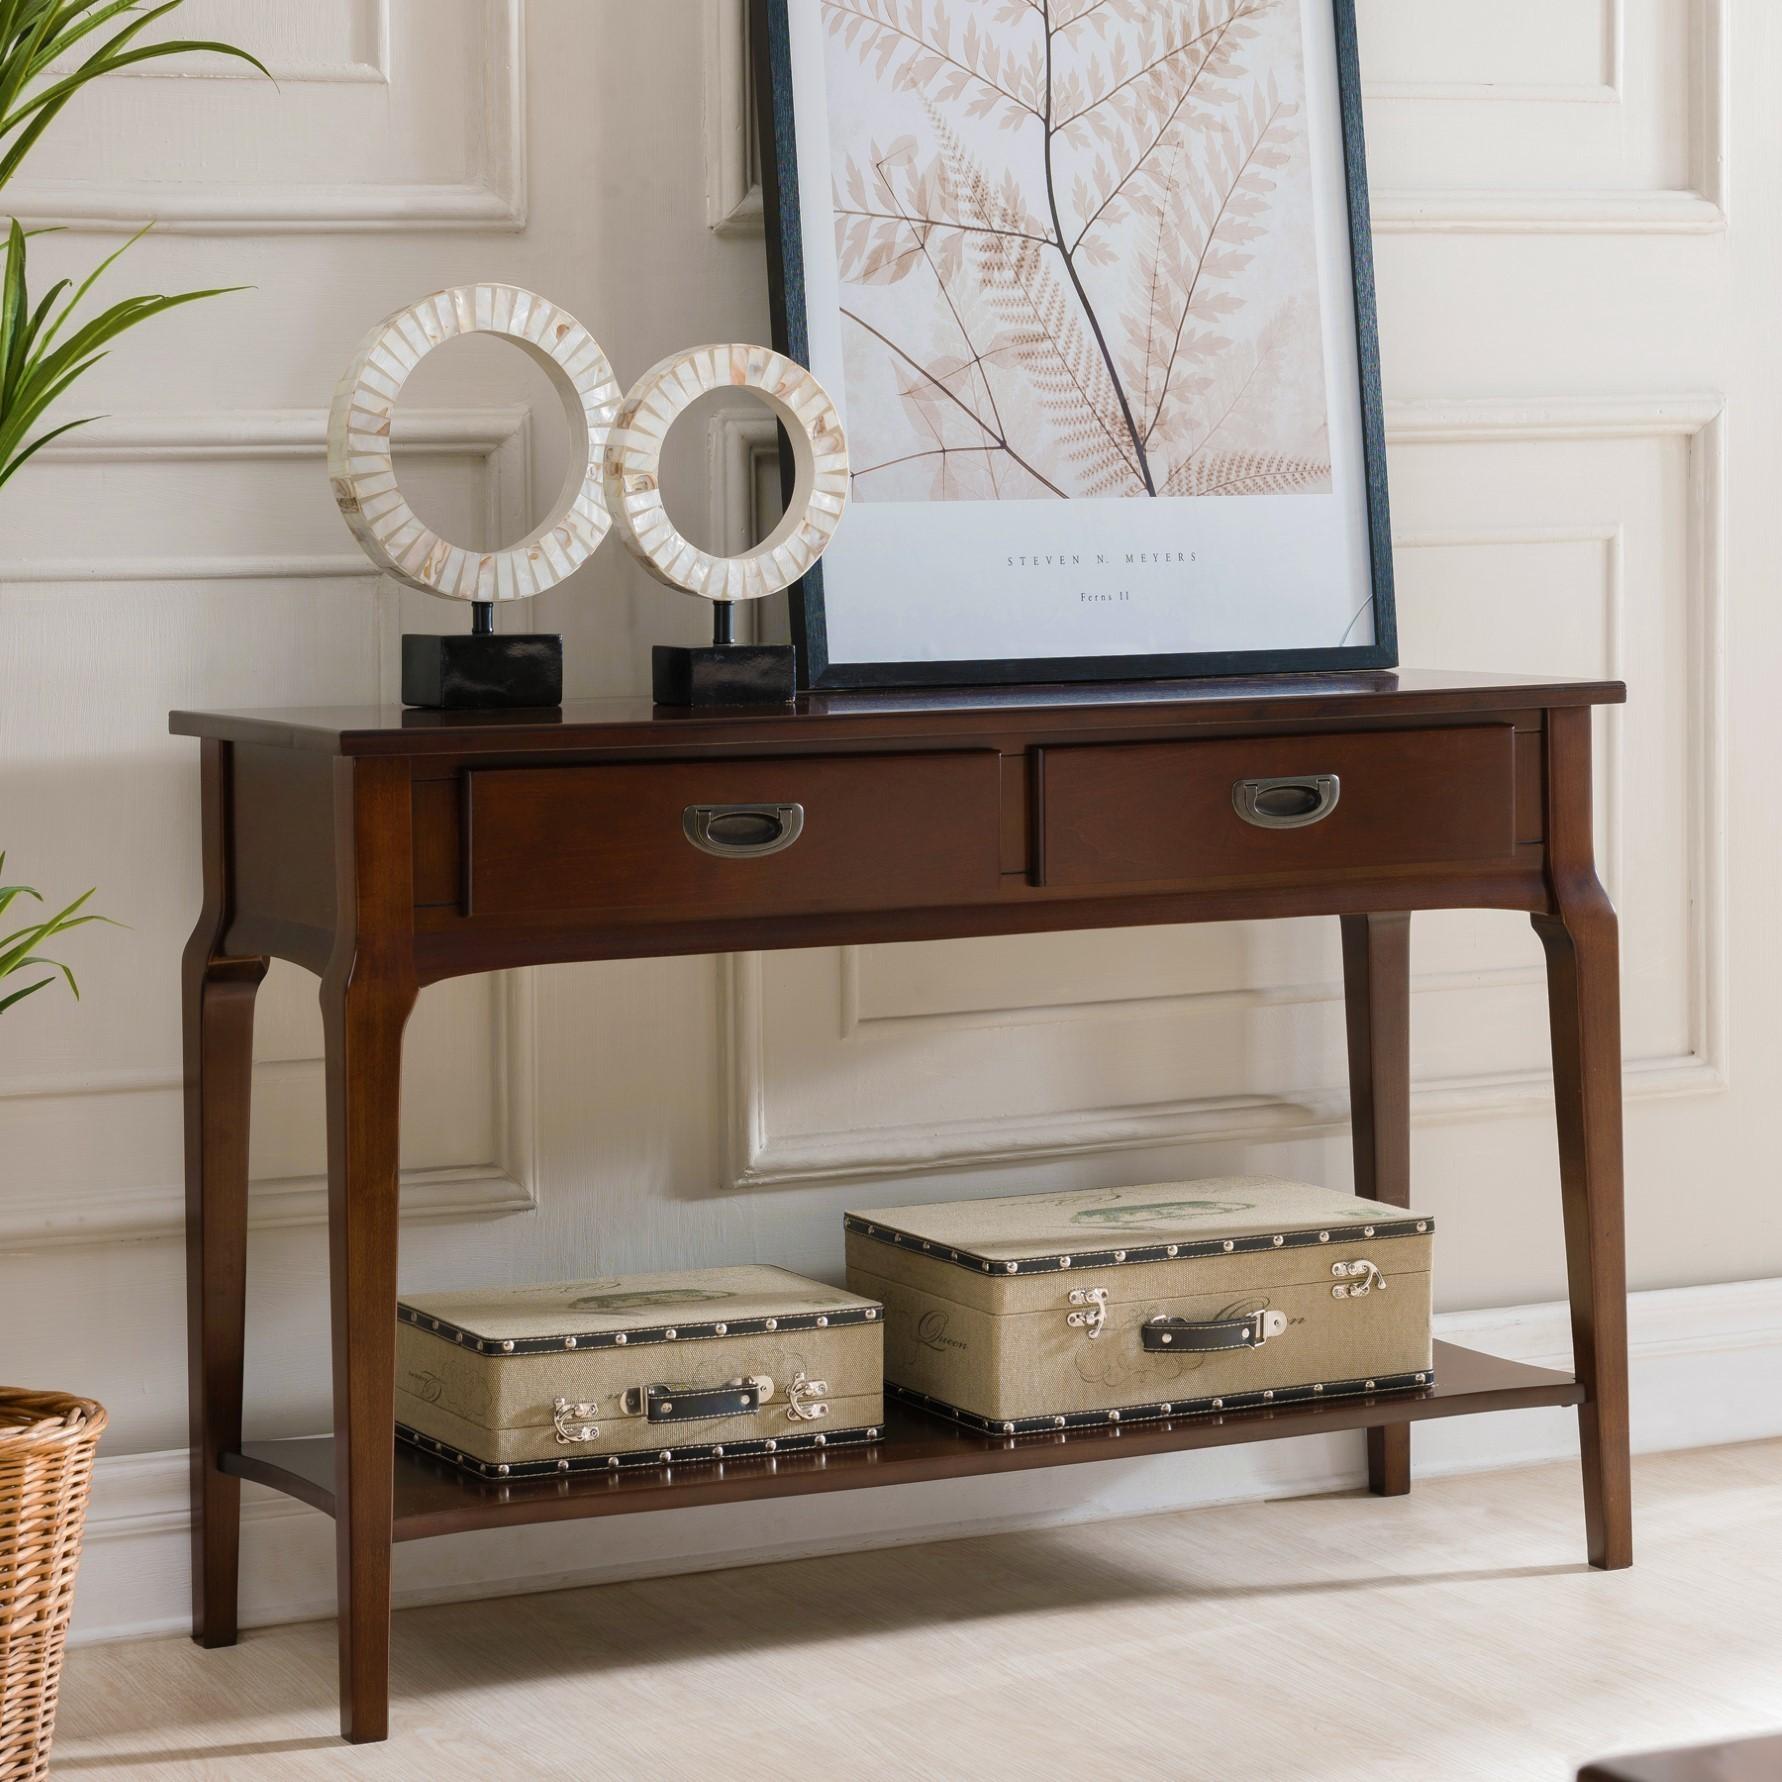 Kd Furnishings Chocolate Cherry Wood 2 Drawer Sofa Table